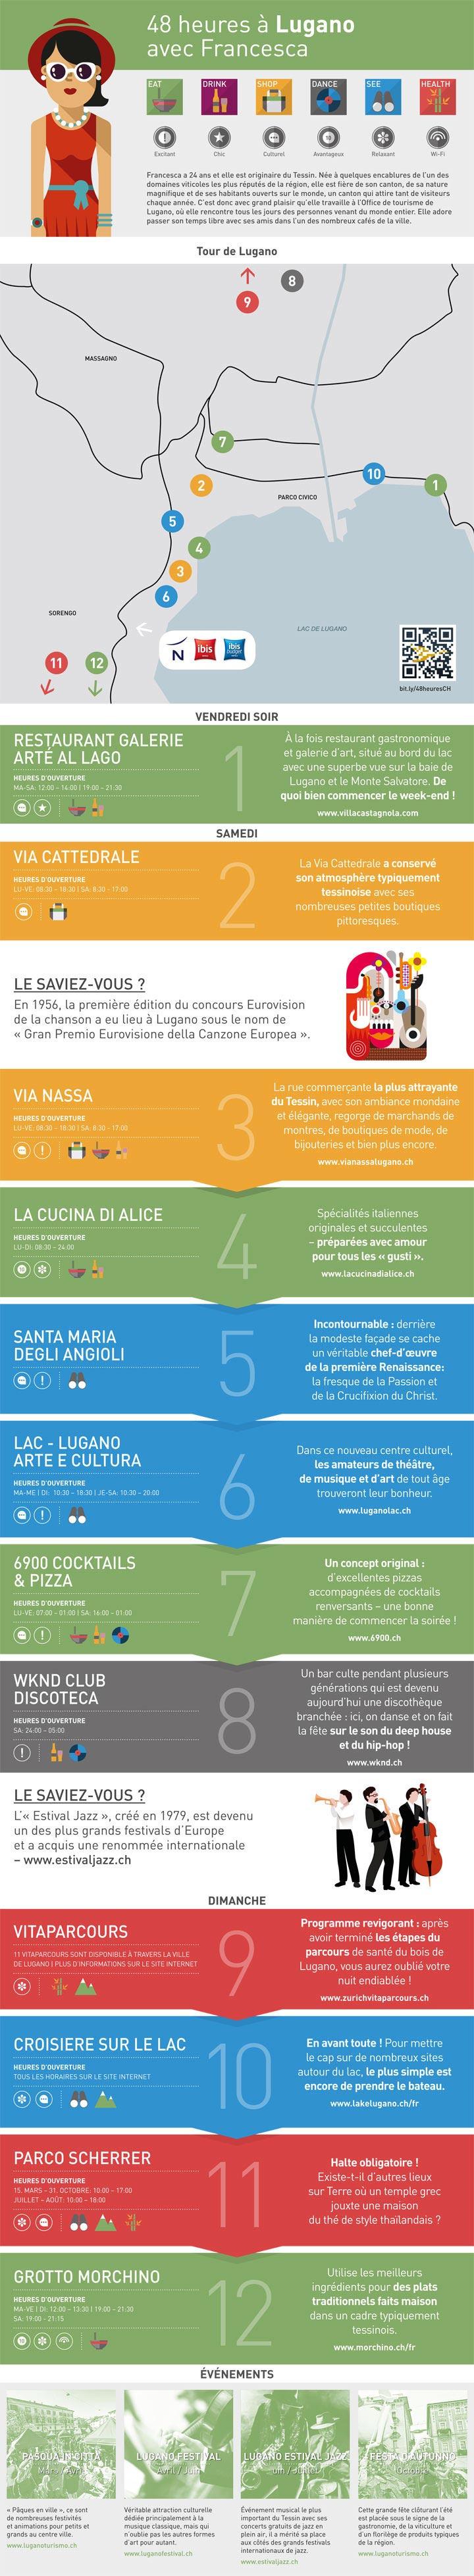 Infographie LUGANO